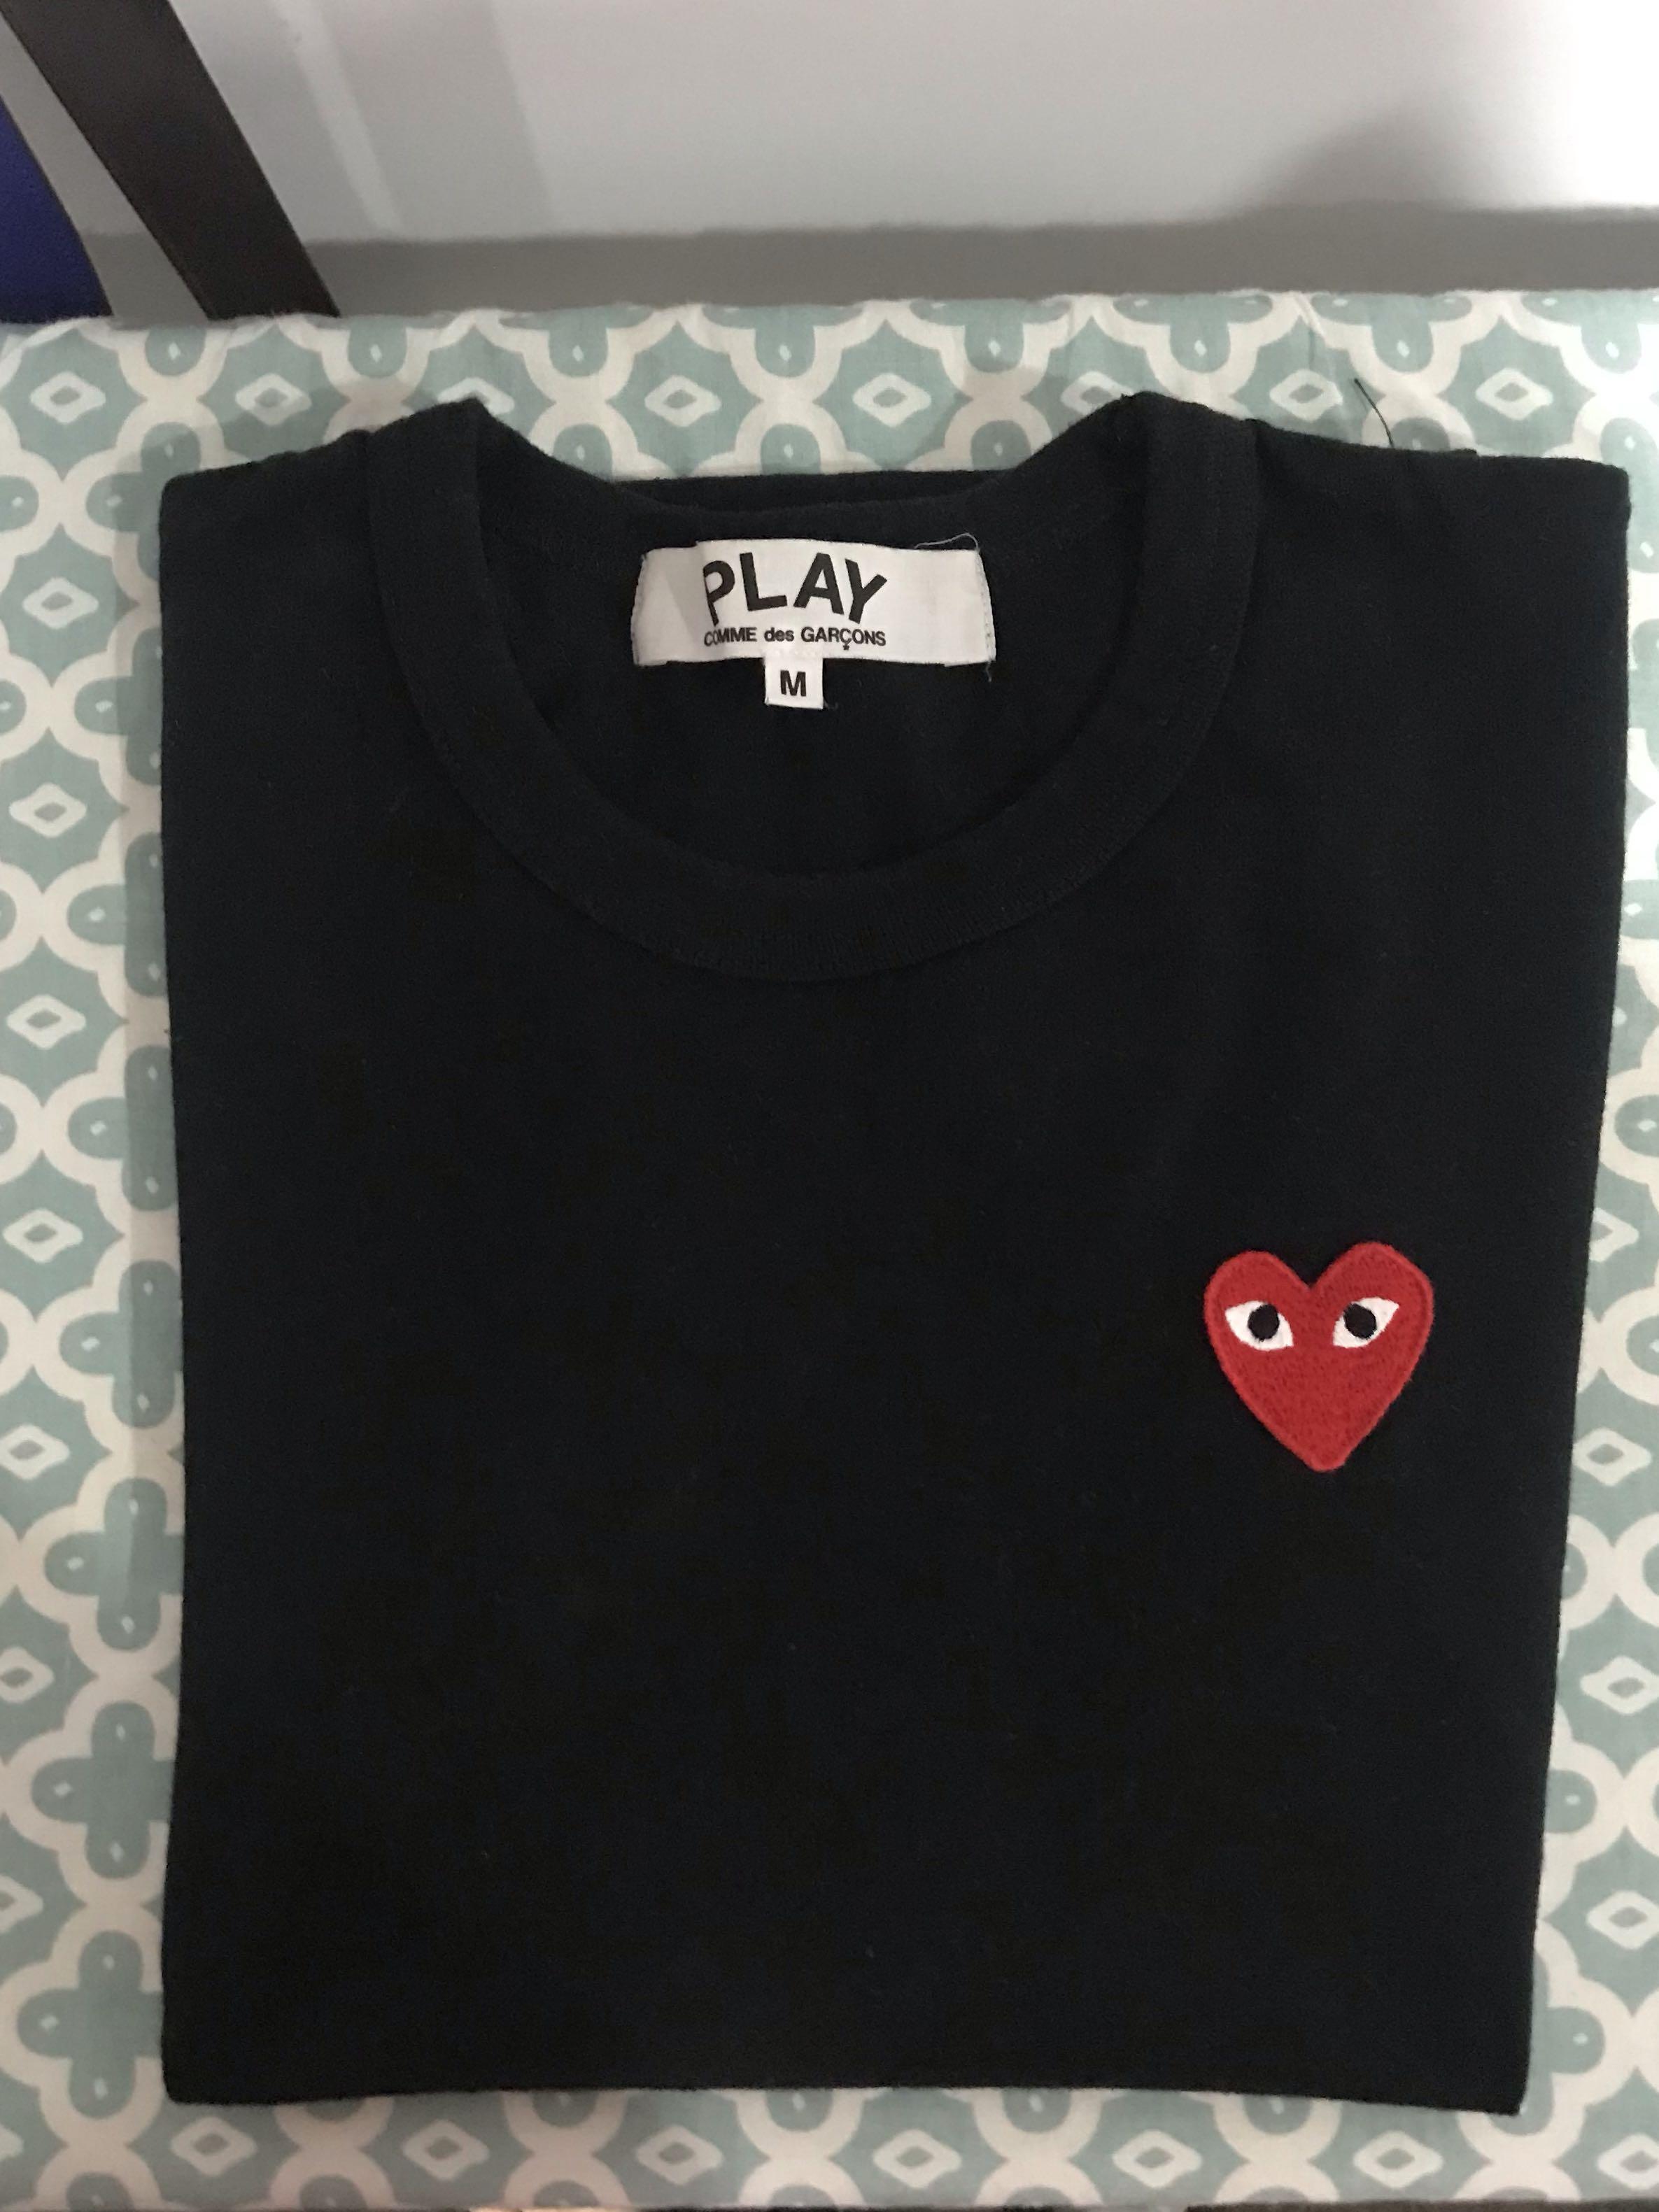 PLAY comme des garcon tshirt